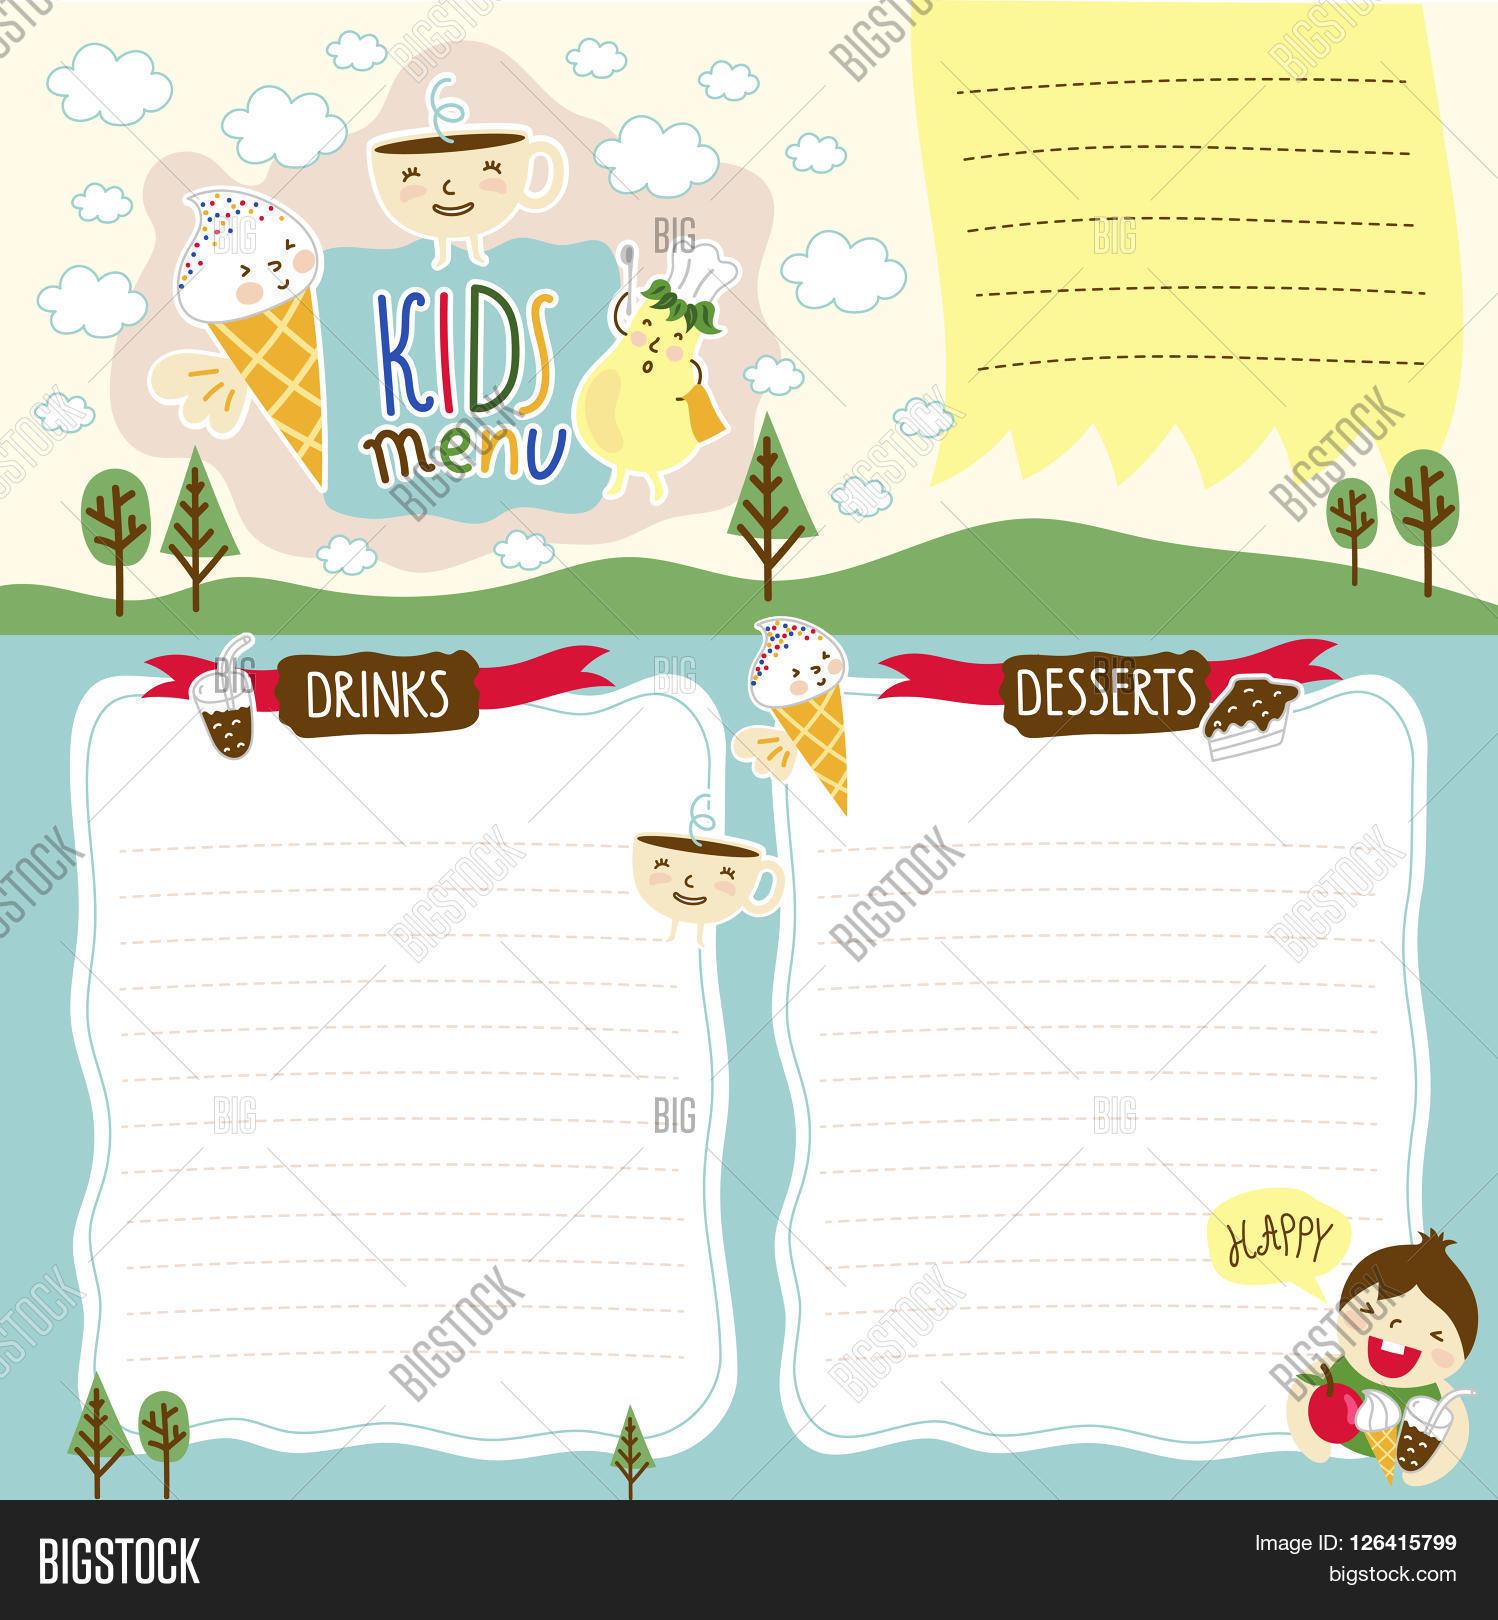 Blank Menu Template For Kids